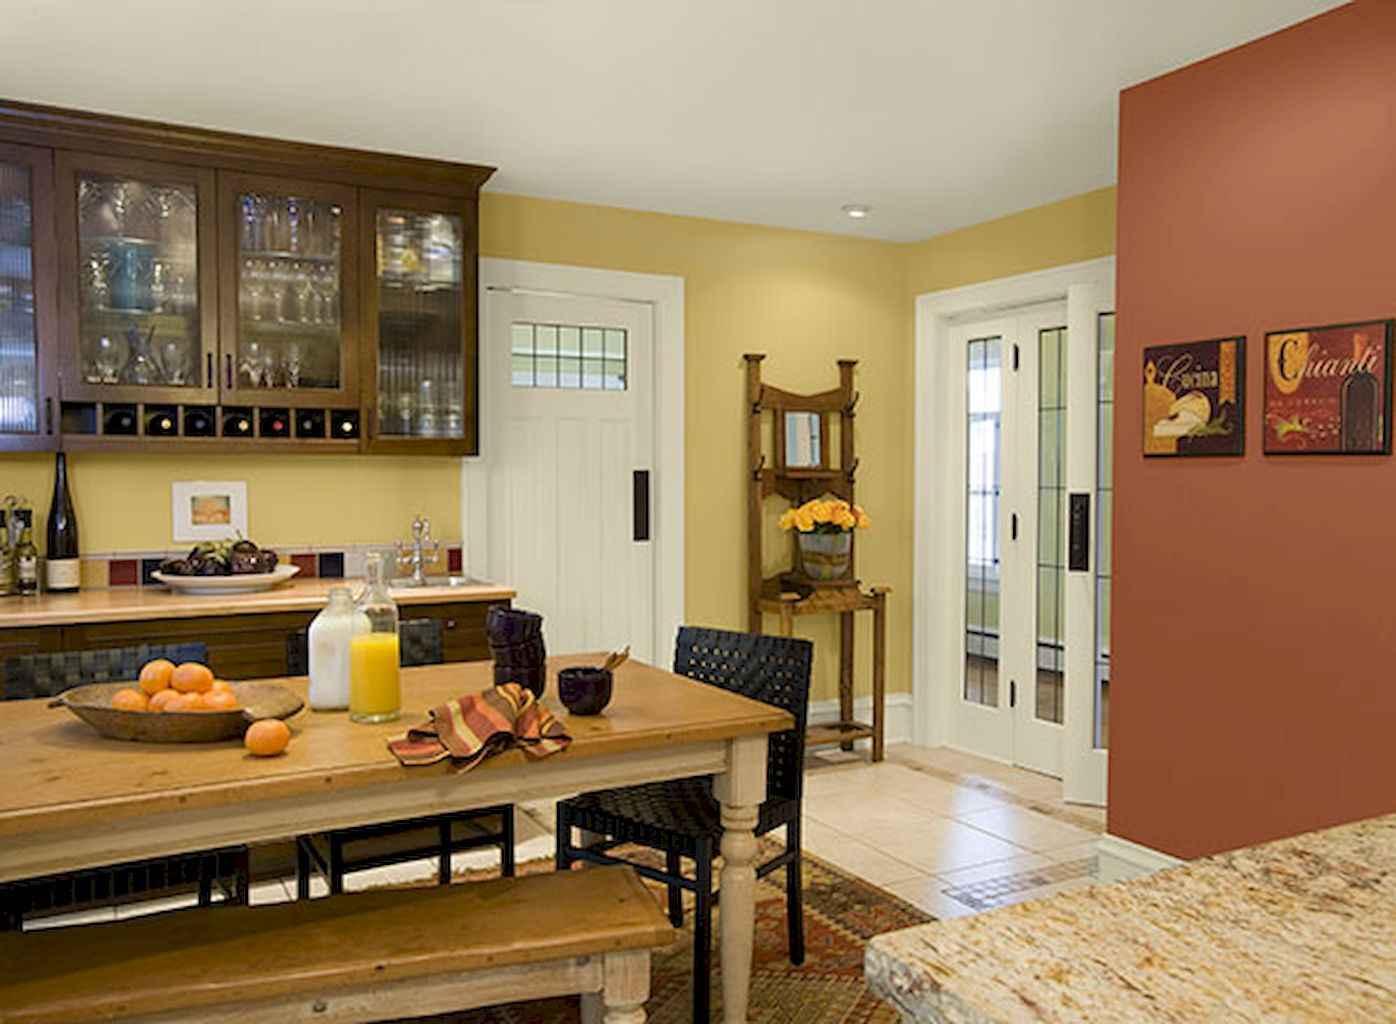 80 Elegant Harmony Interior Design Ideas For First Couple (54)